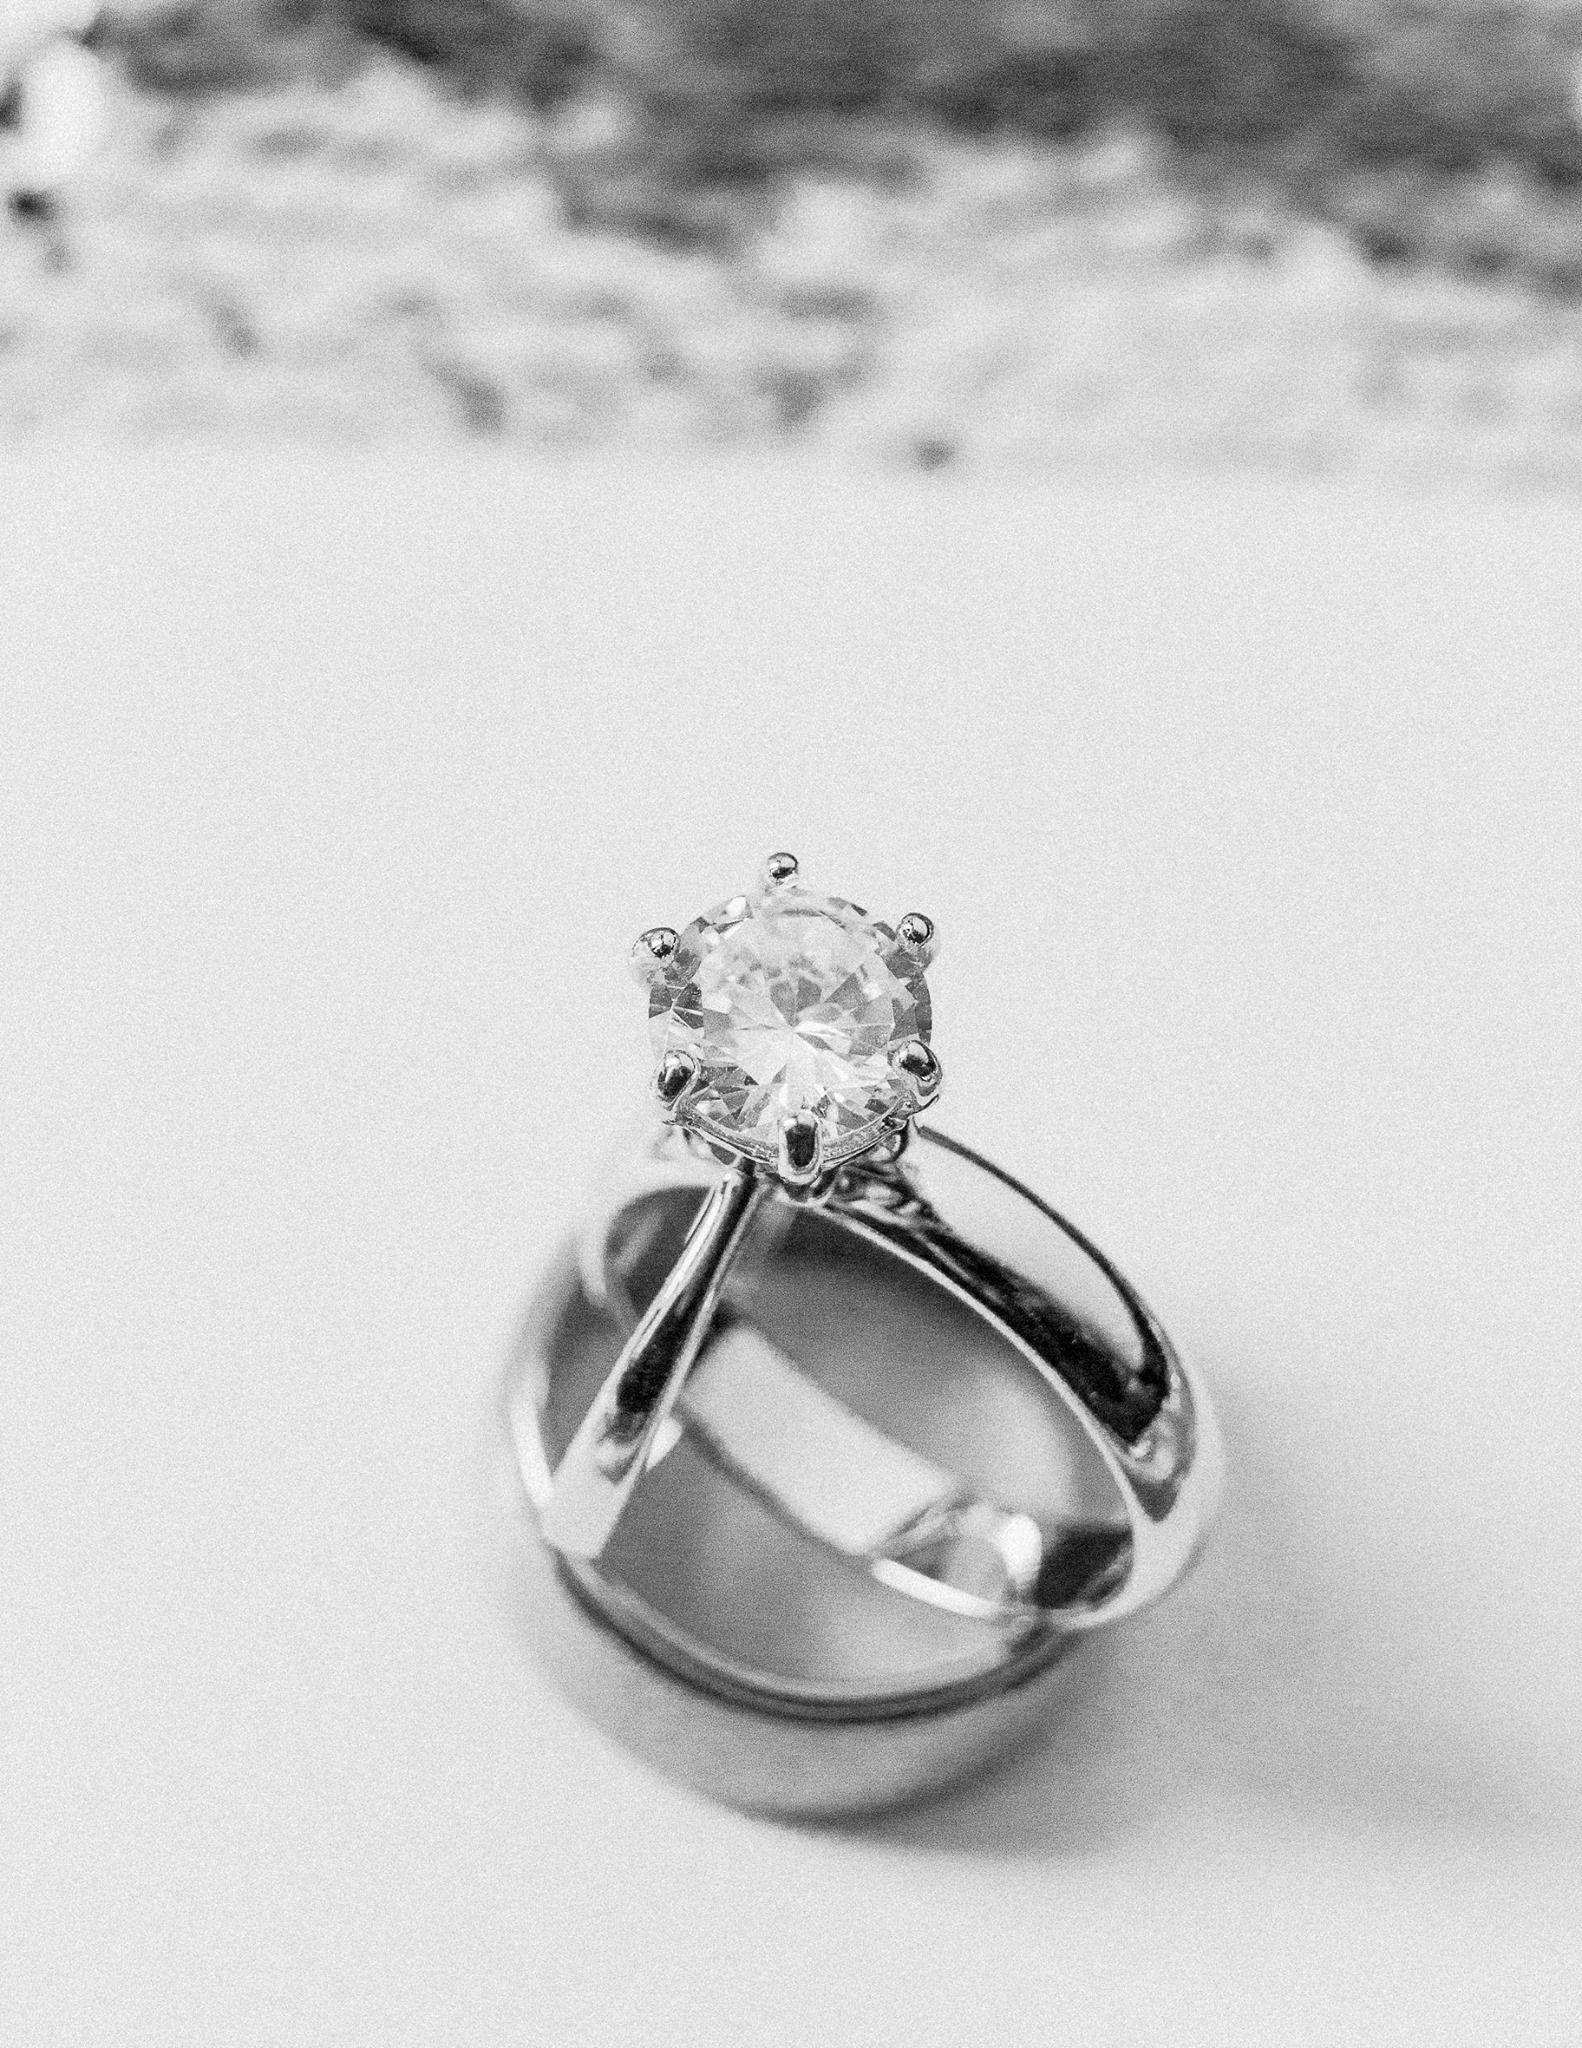 John And Emma Wedding Rings Simple Elegance Diamond Platinum Daniel Valentina Photography